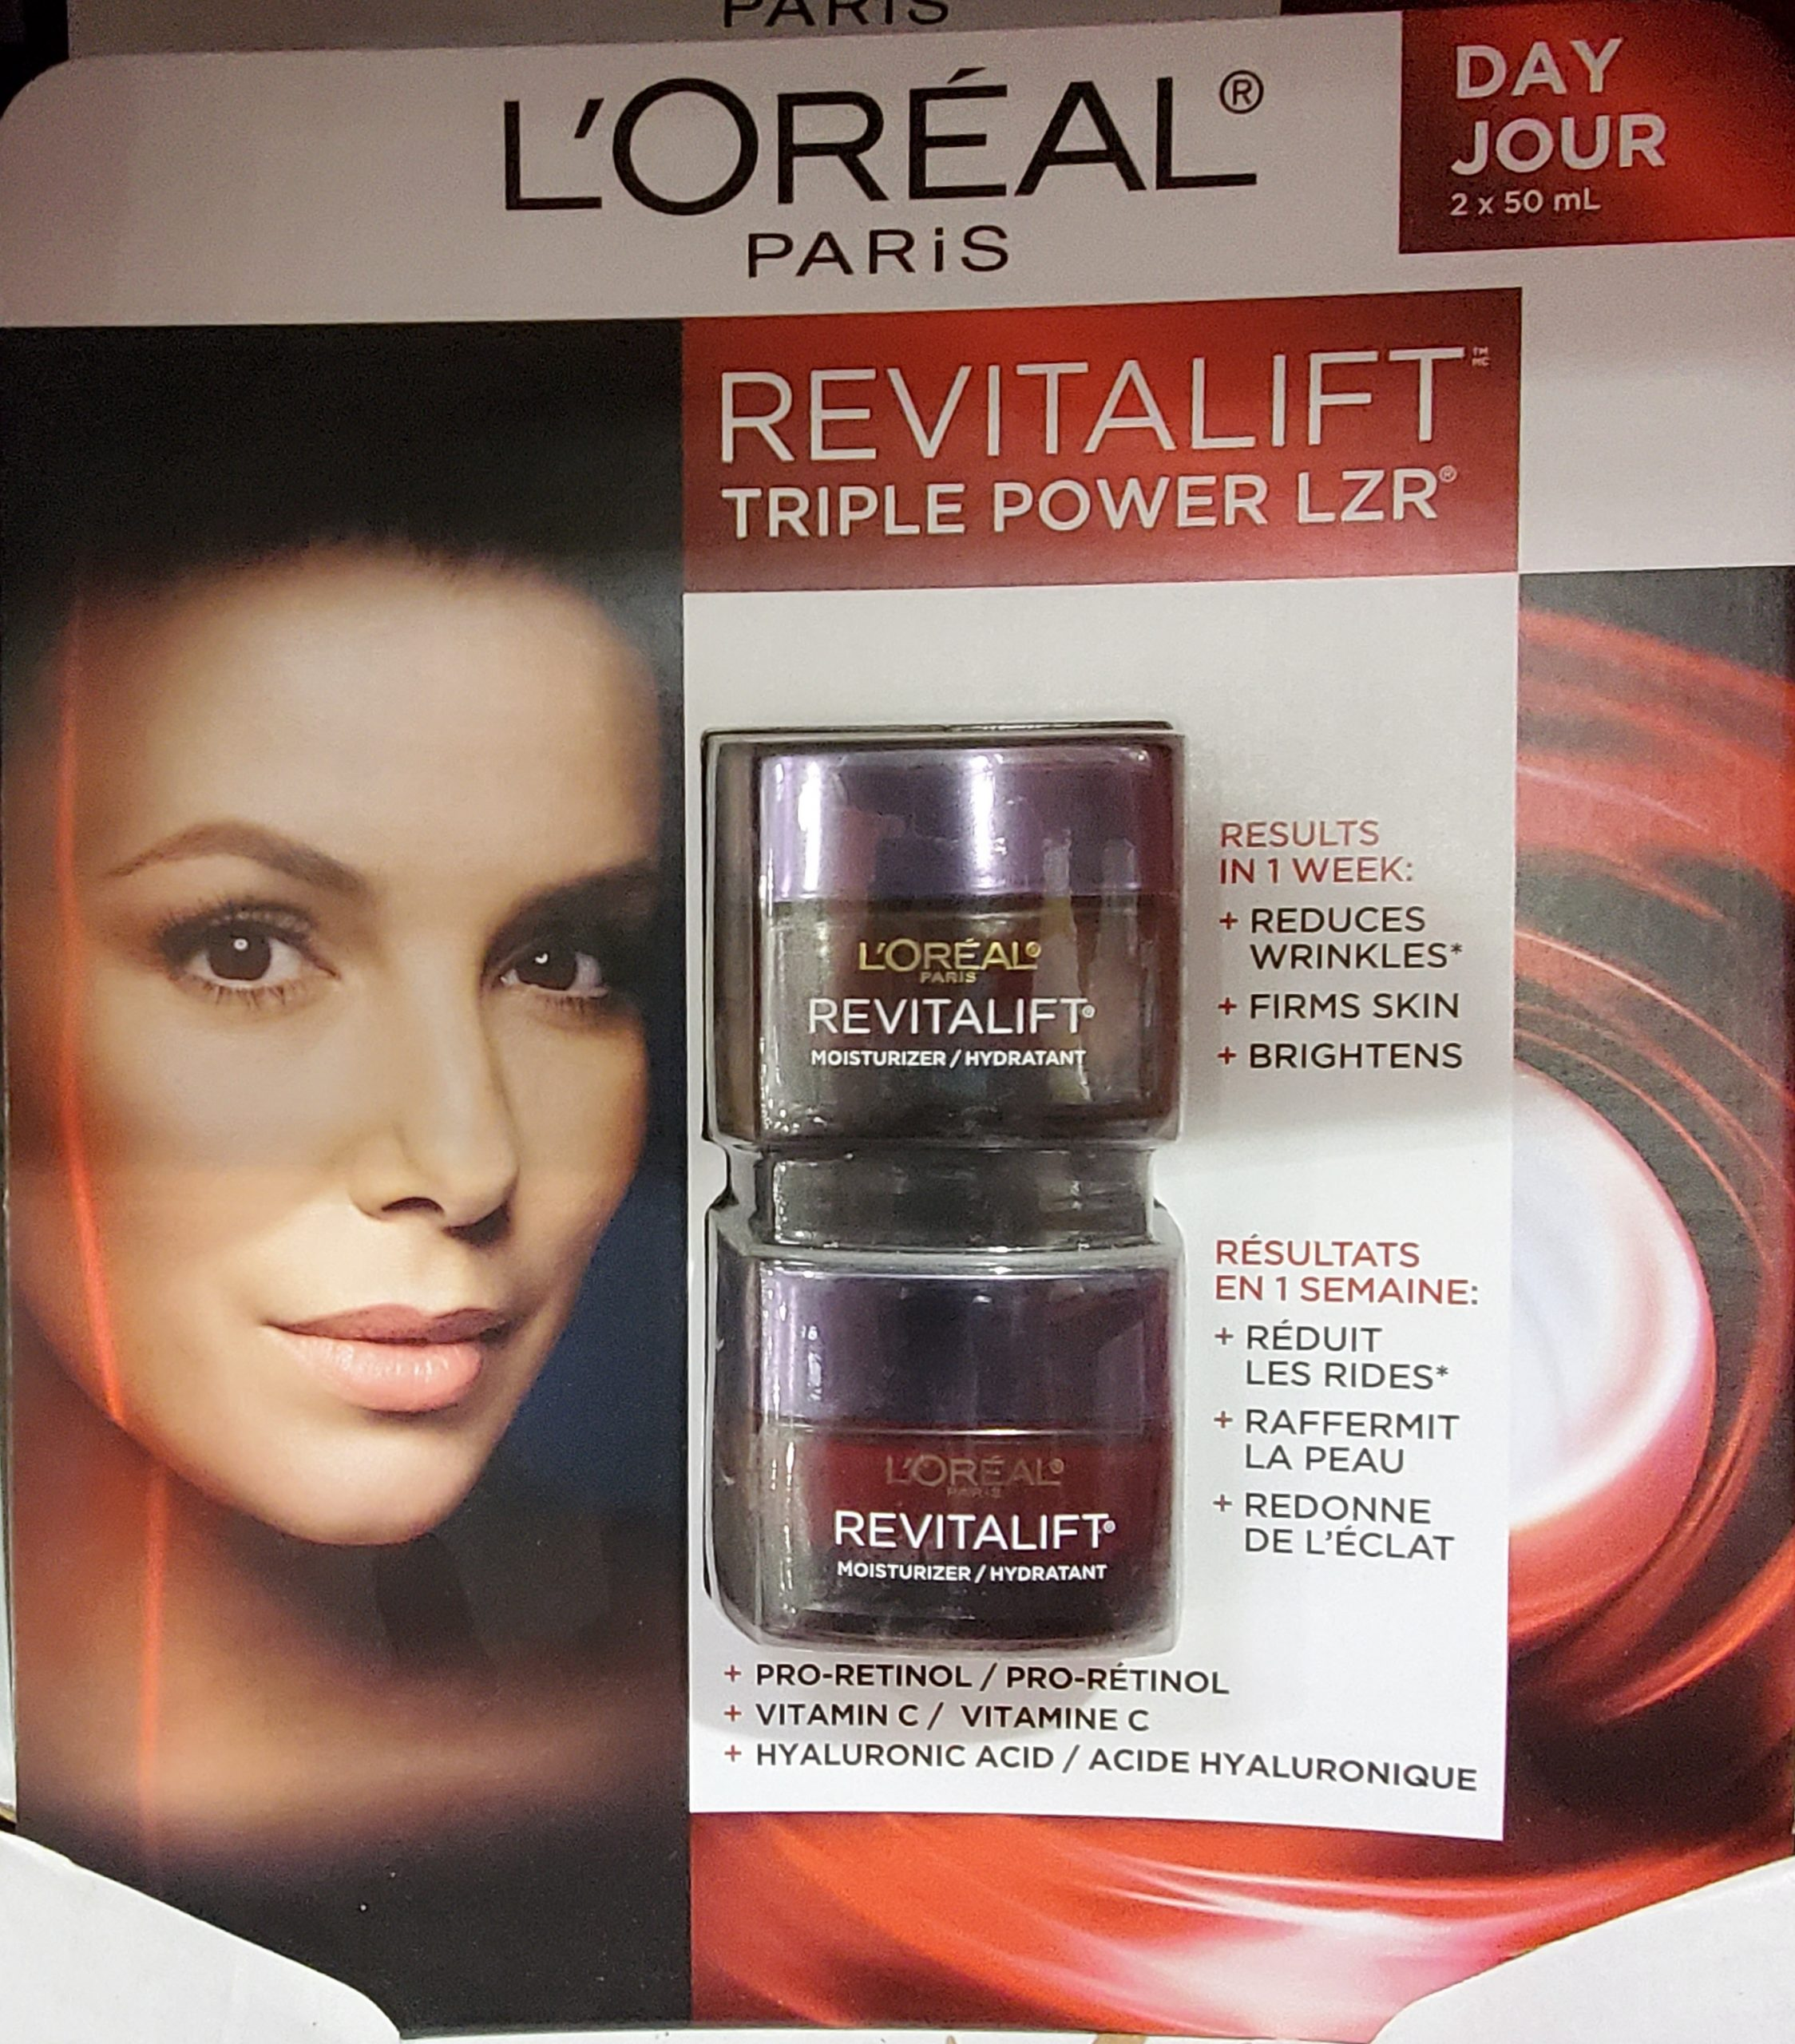 L'Oréal Revitalift Triple Power LZR Night Mask